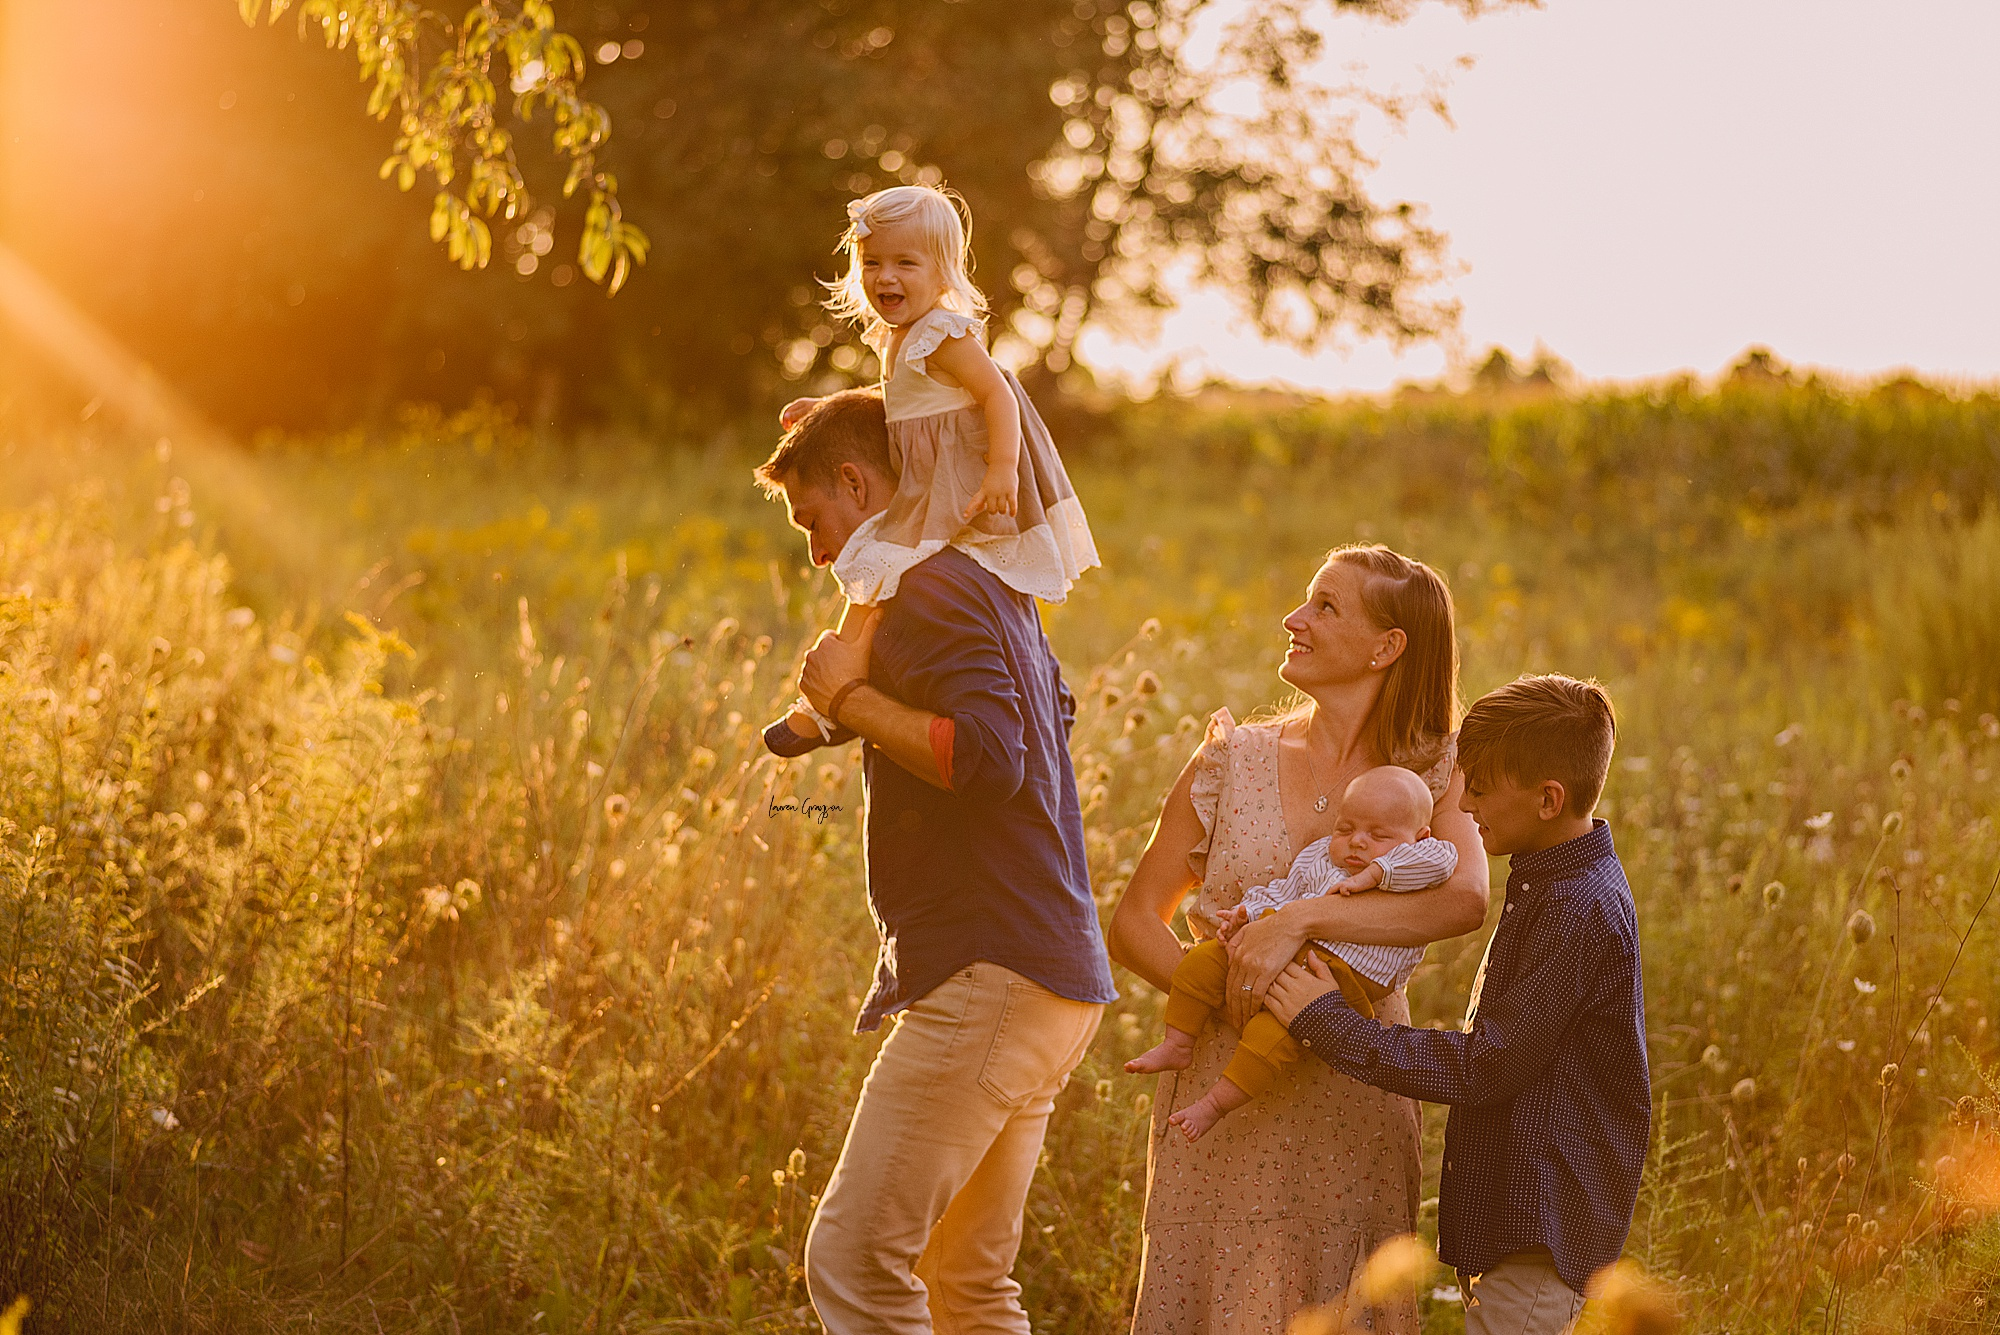 lauren-grayson-photography-akron-ohio-family-mom-boys-field-spring-outdoor-session_0039.jpg